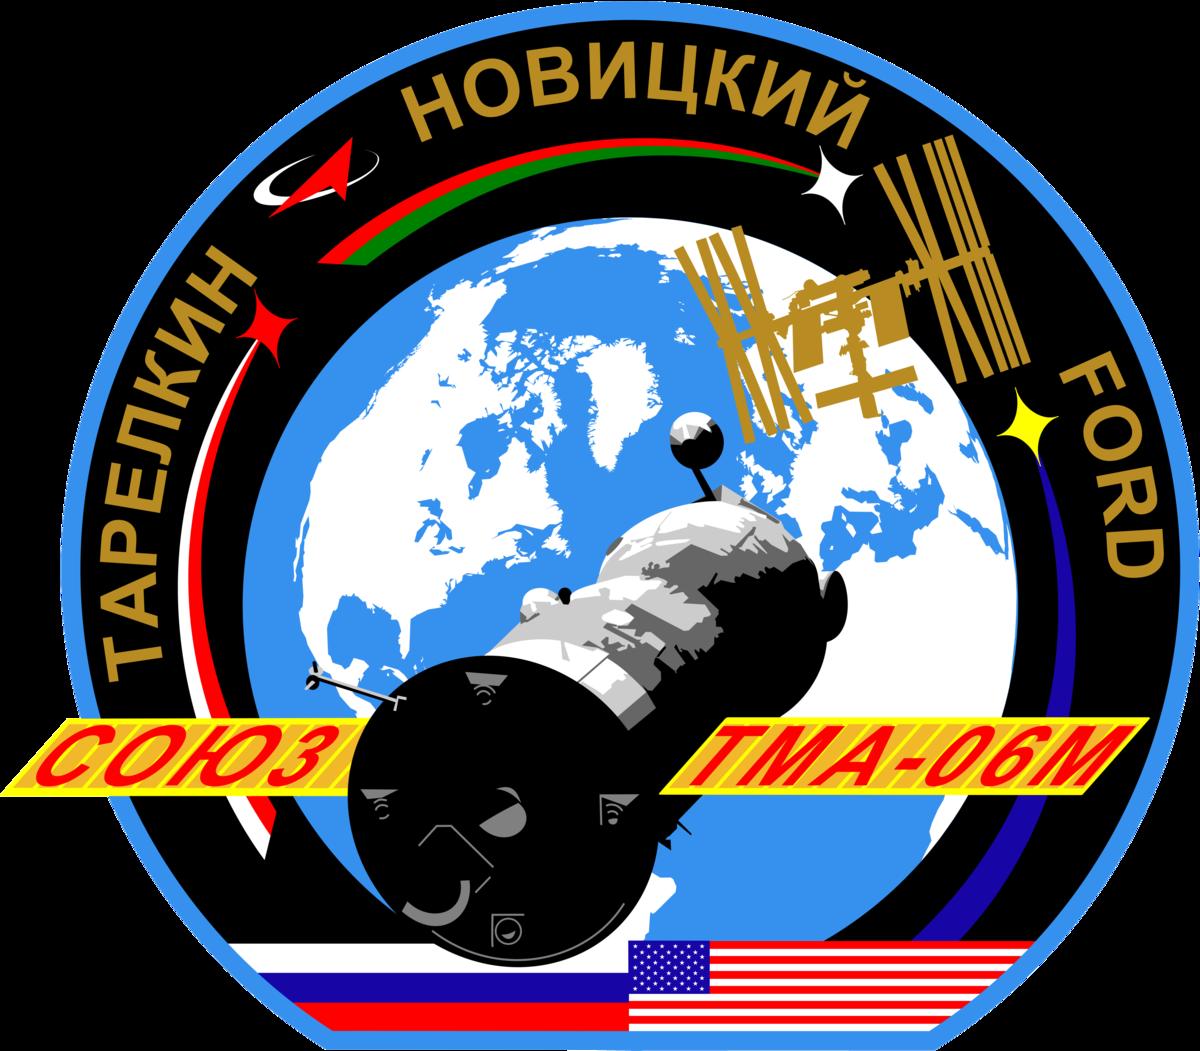 Soyuz tma m wikipedia. Missions clipart mission control